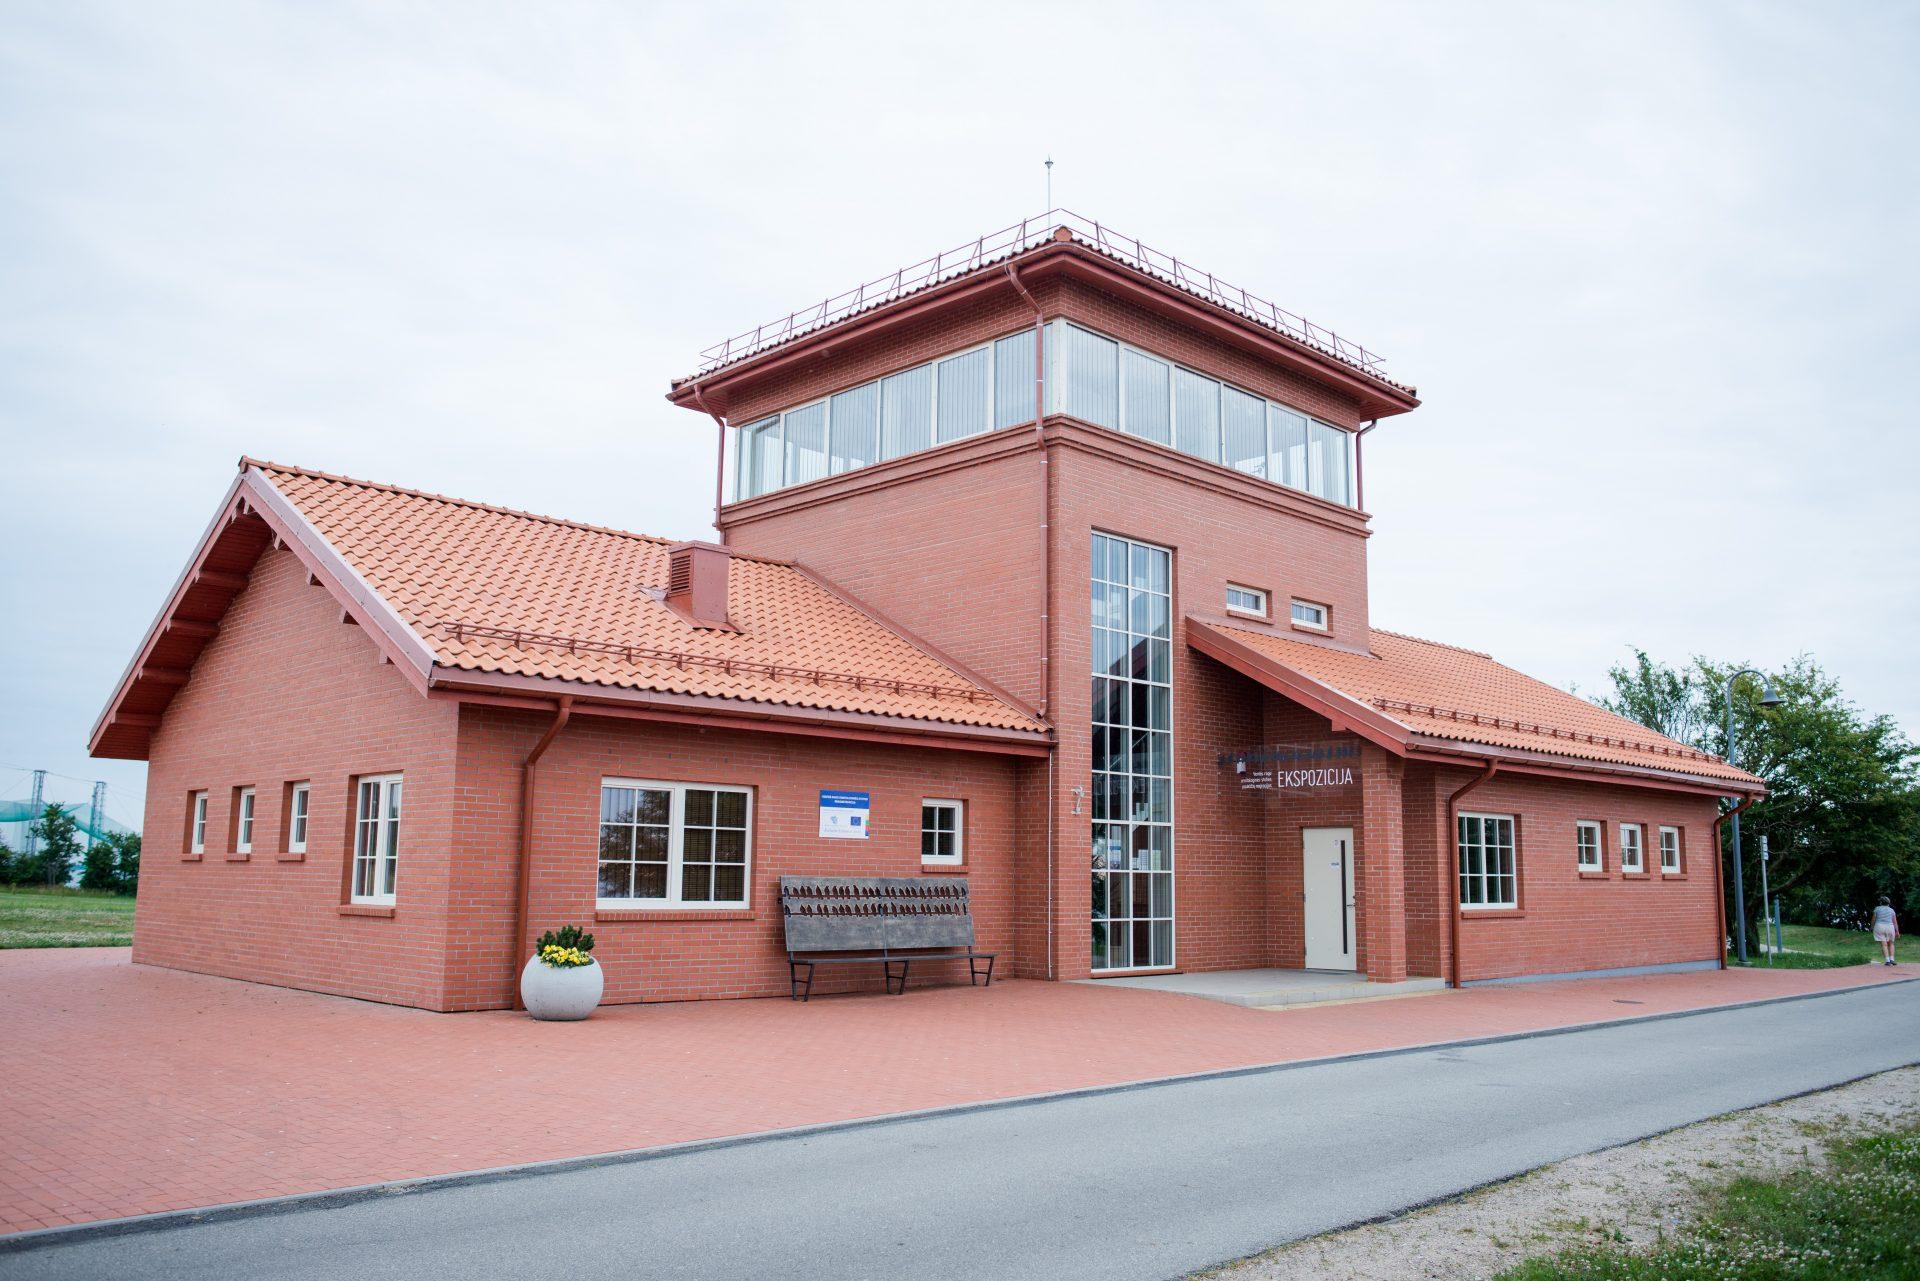 VENTĖS RAGO ORNITHOLOGY STATION VISITORS CENTER RECONSTRUCTION